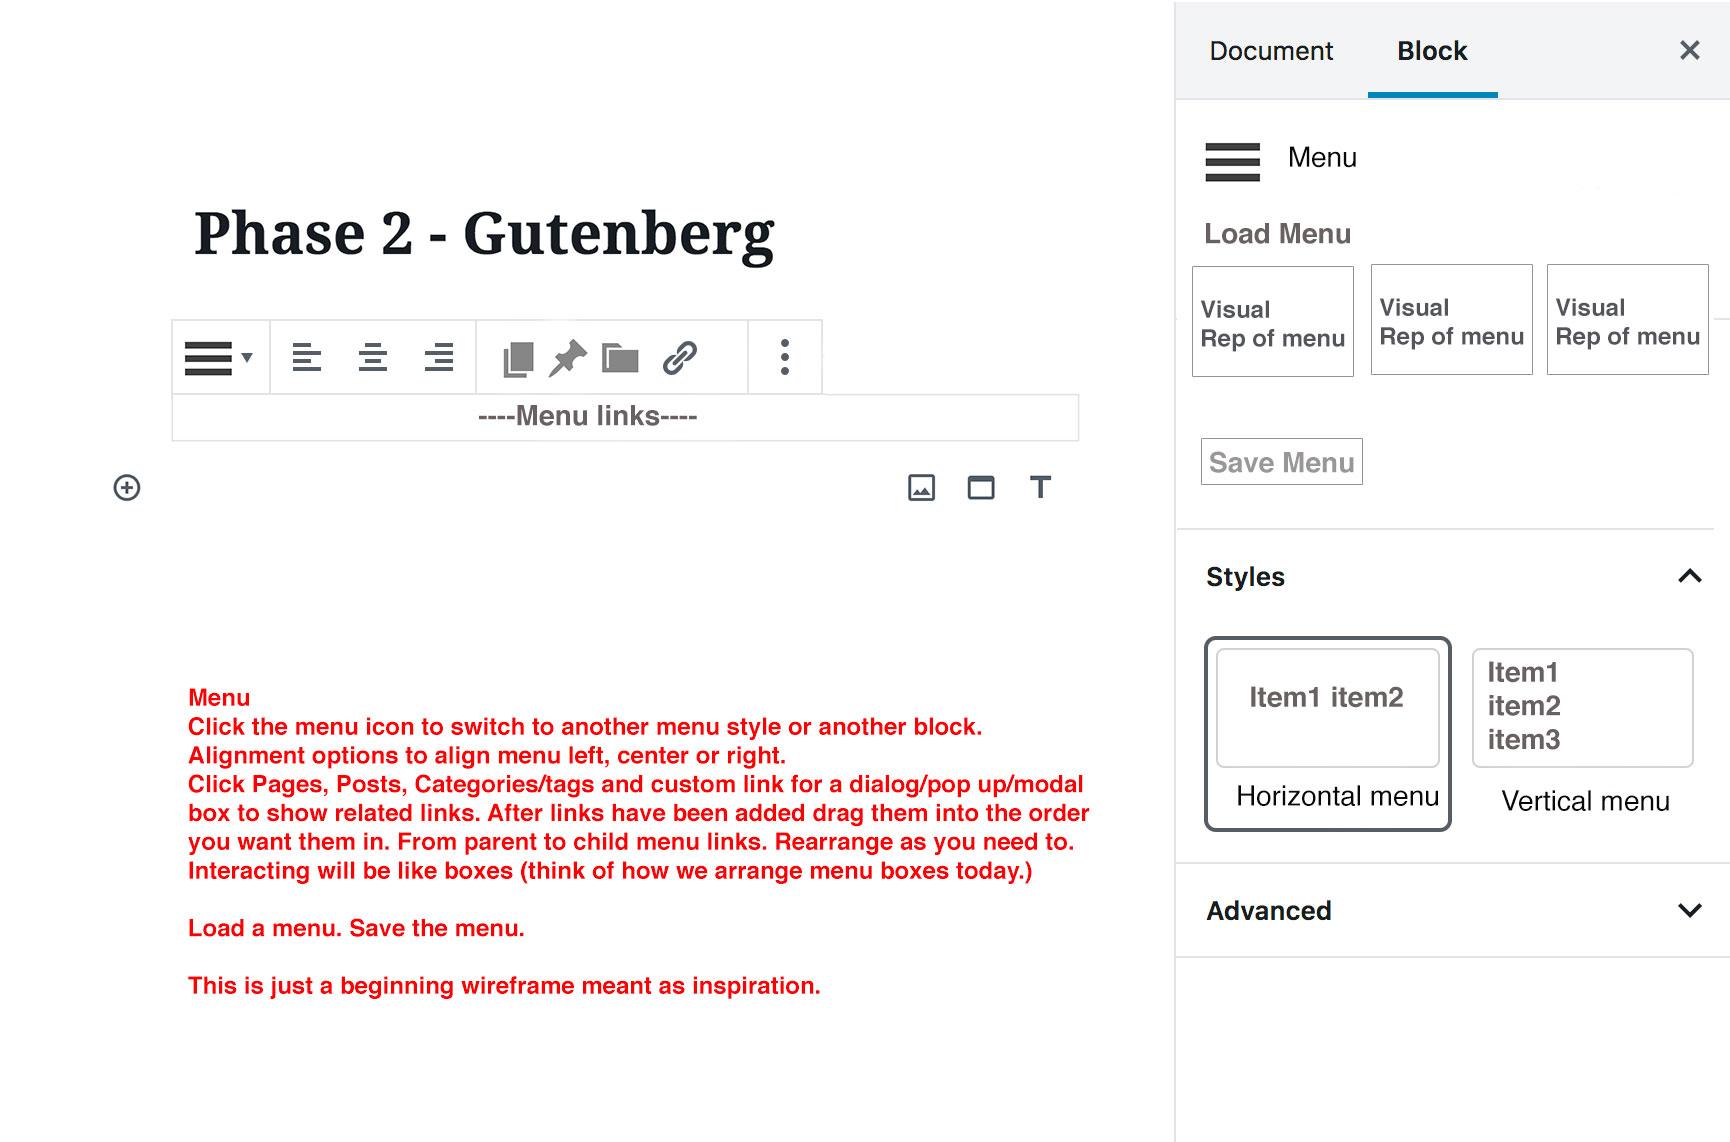 menu-gutenberg-suggestion